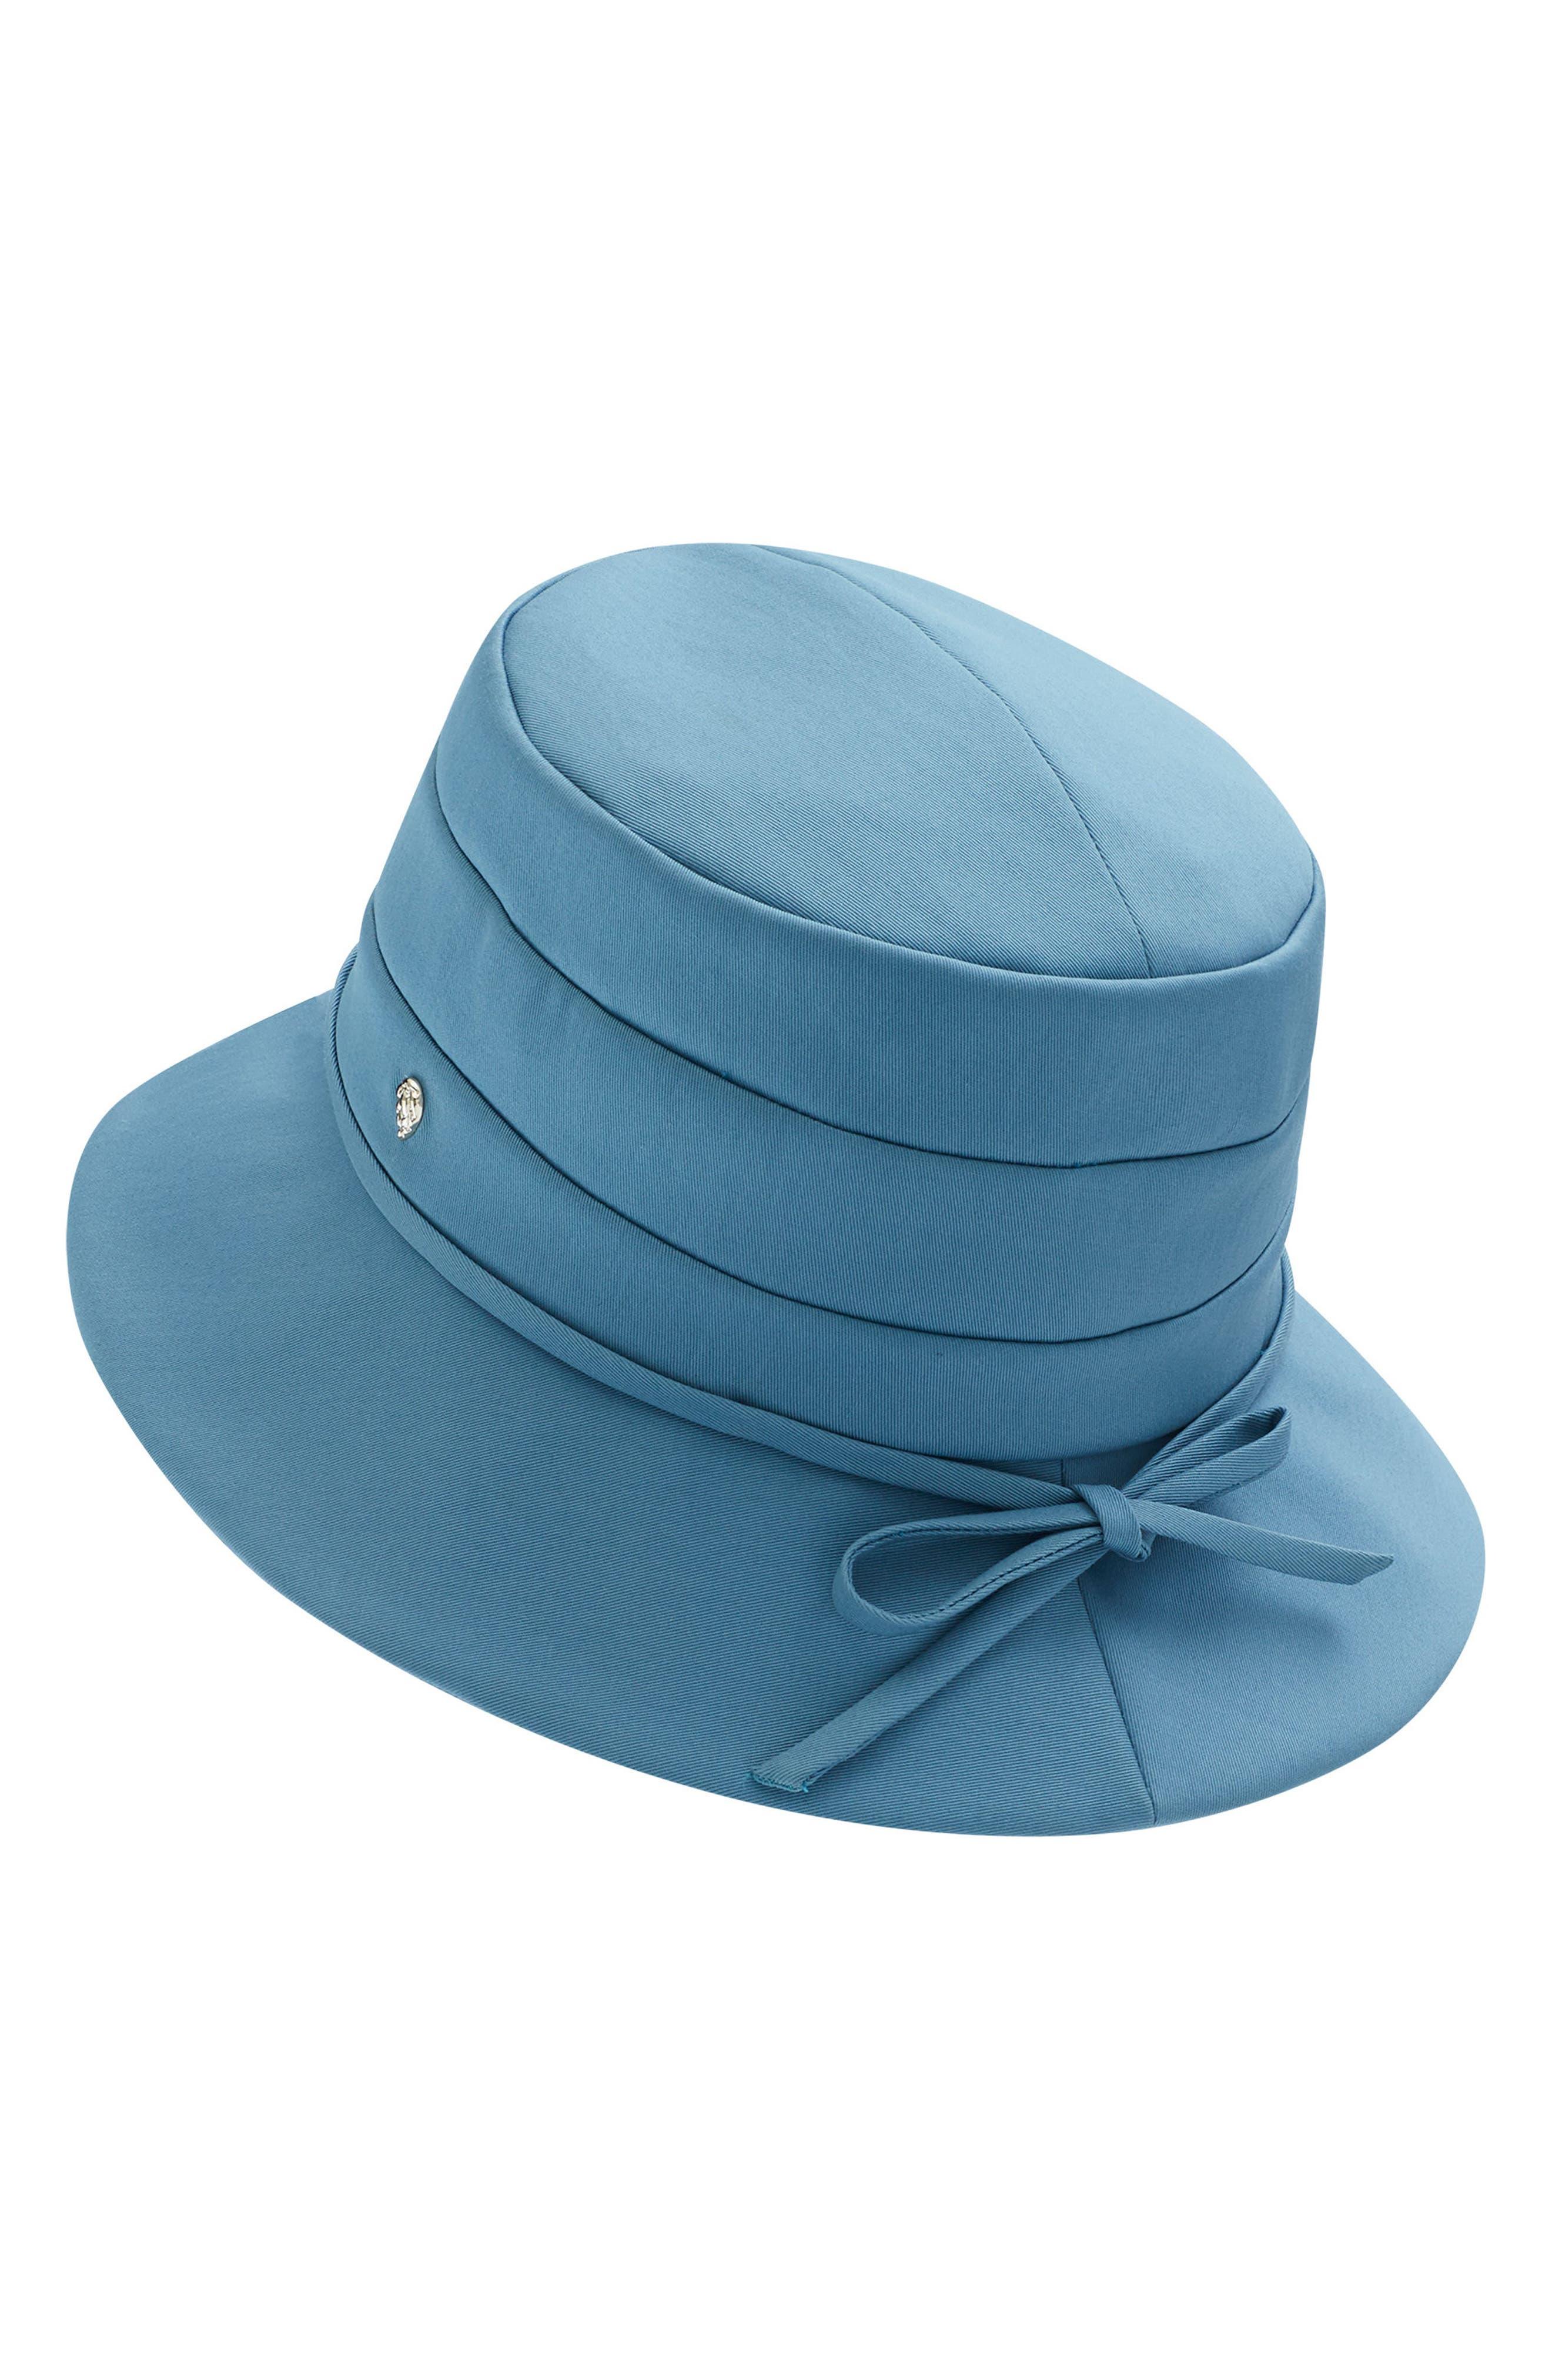 HELEN KAMINSKI MEDIUM BRIM WATER-RESISTANT HAT - BLUE